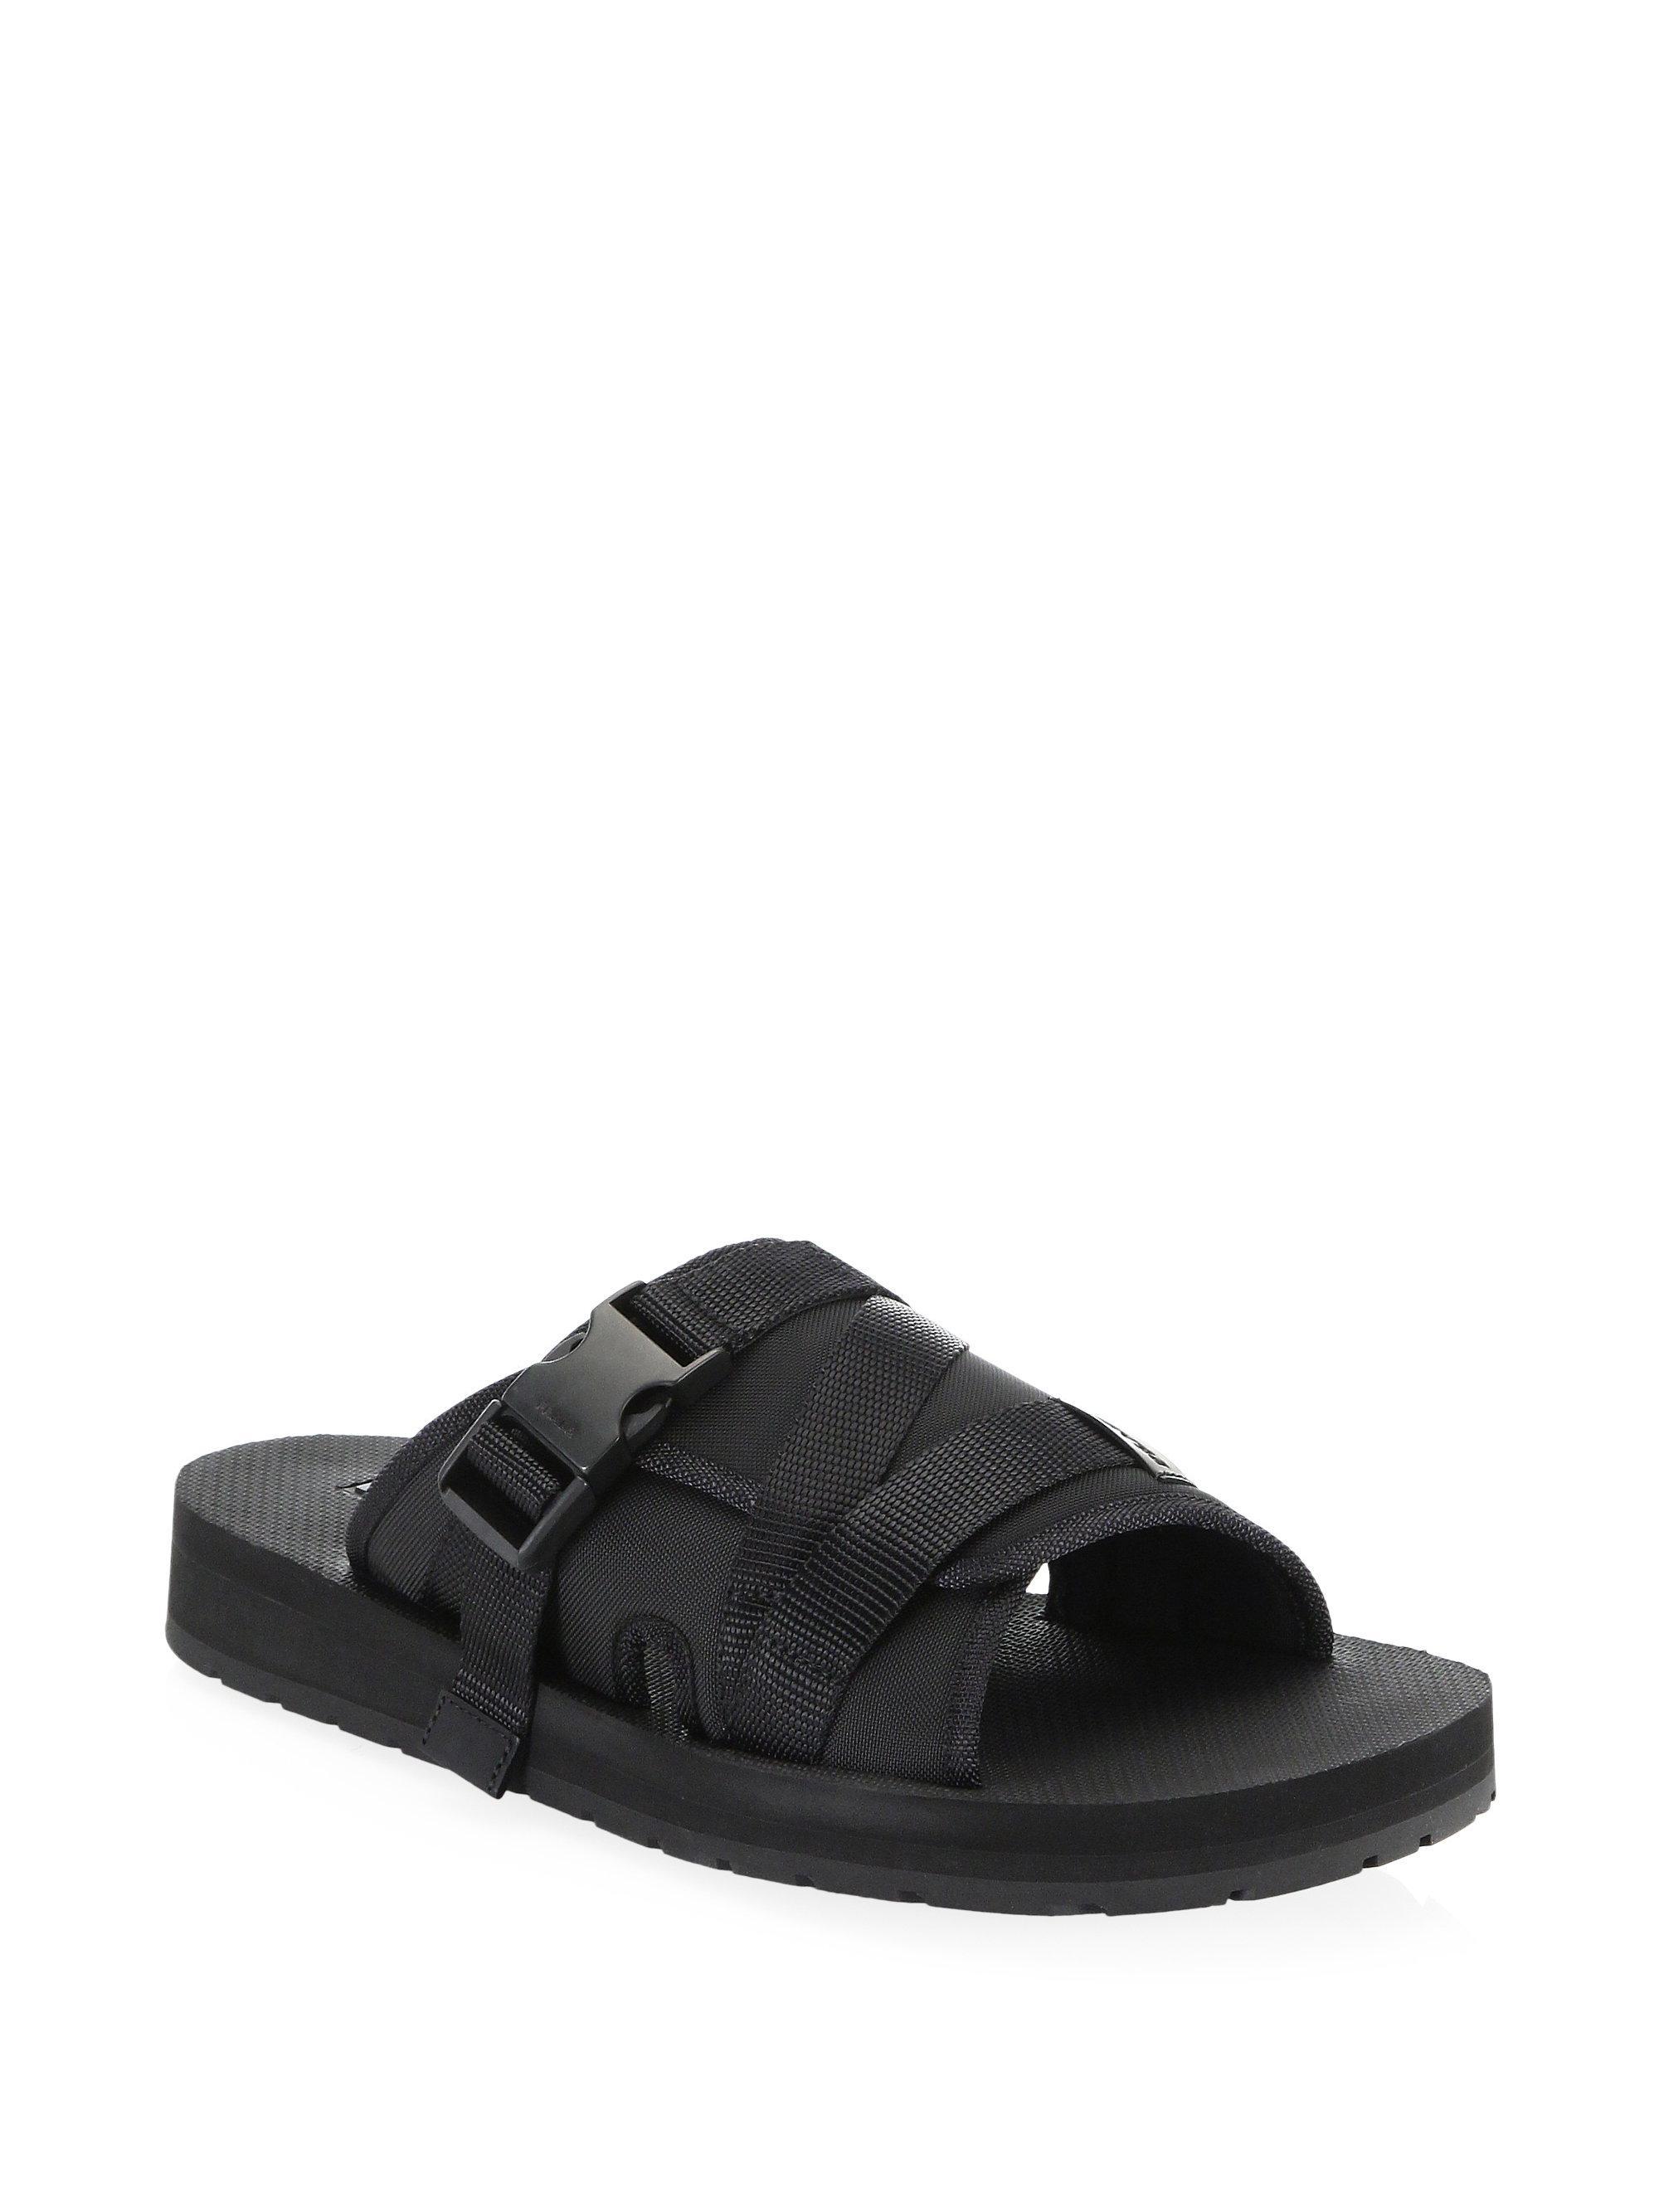 77ab7ac65296 Prada Men s Buckle Wrap Slides - Black - Size 6 Uk (7 Us) Sandals in ...